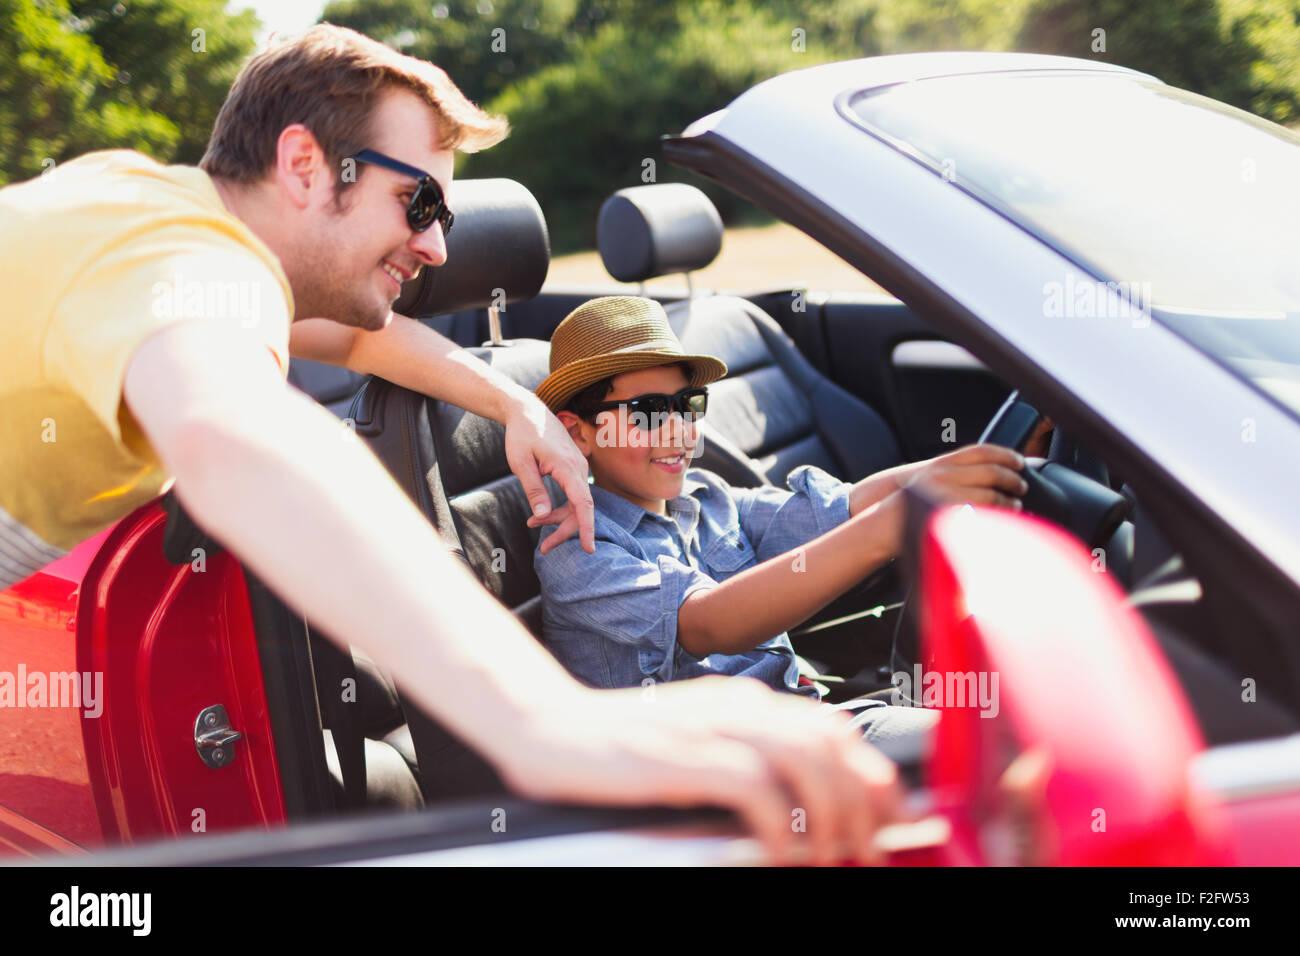 Vater beobachtete Sohn vorgeben, Fahrt im Cabrio Stockbild